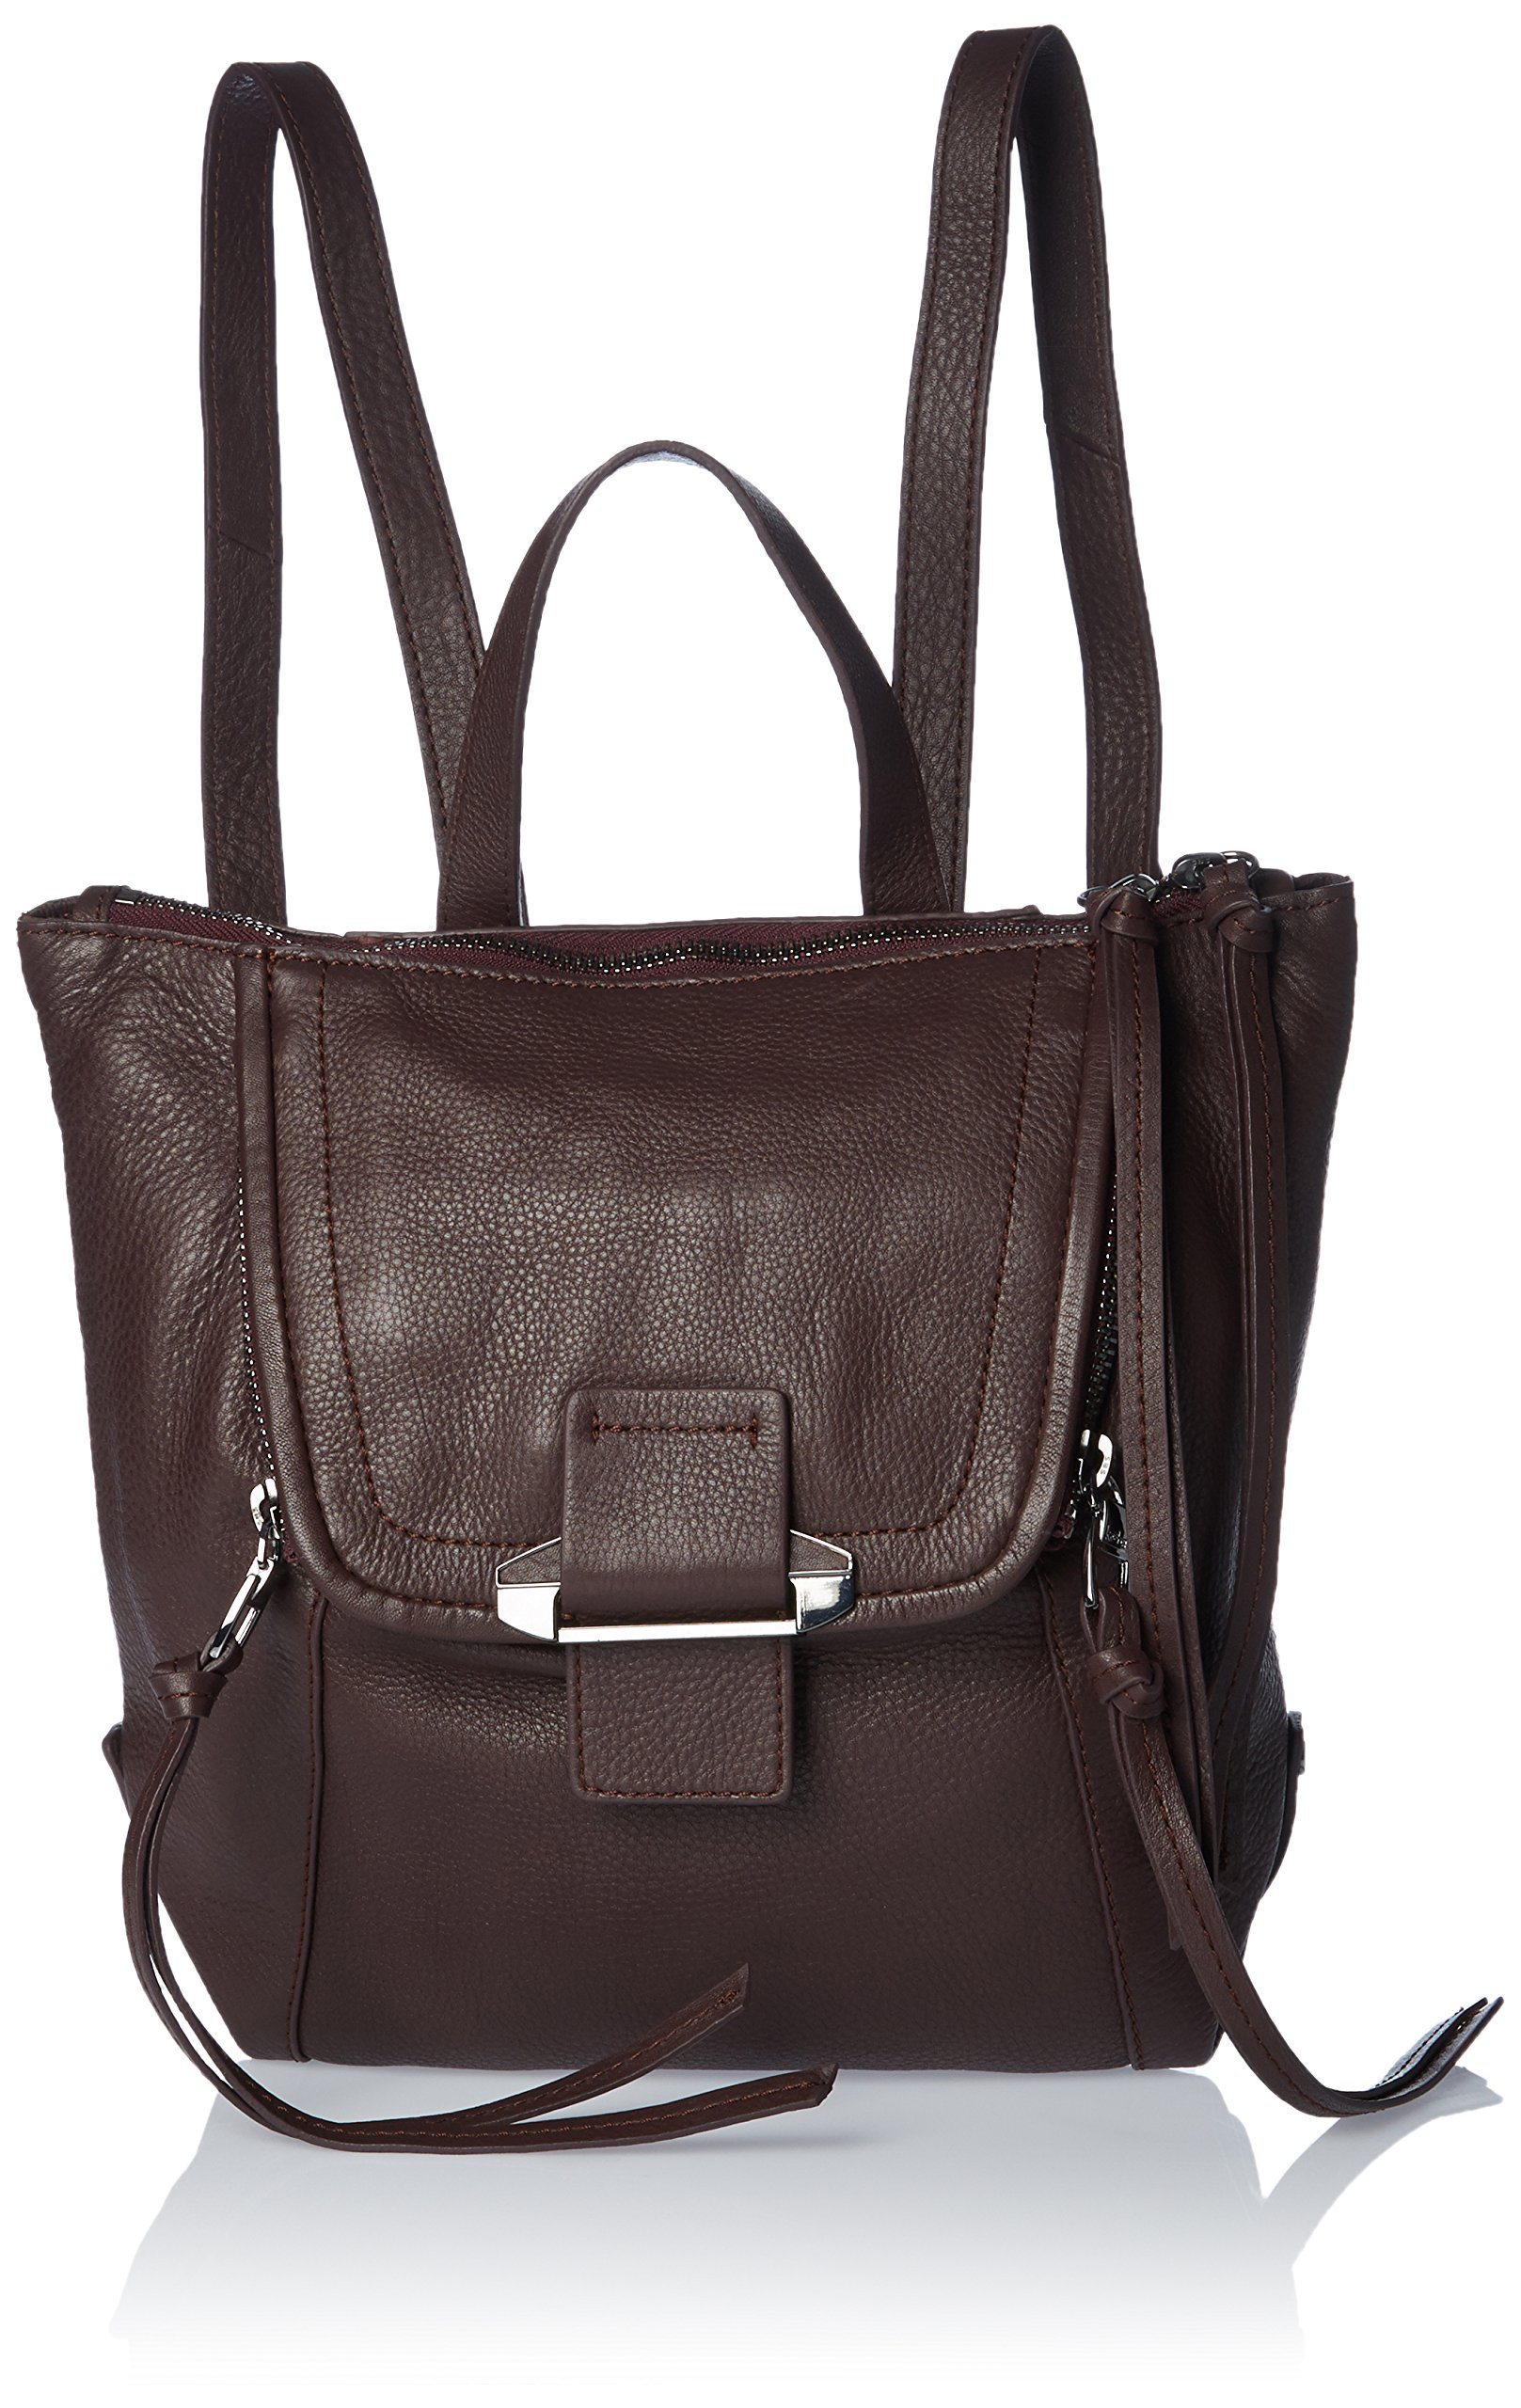 Kooba Handbags Bobbi Mini Backpack, Dark Berry